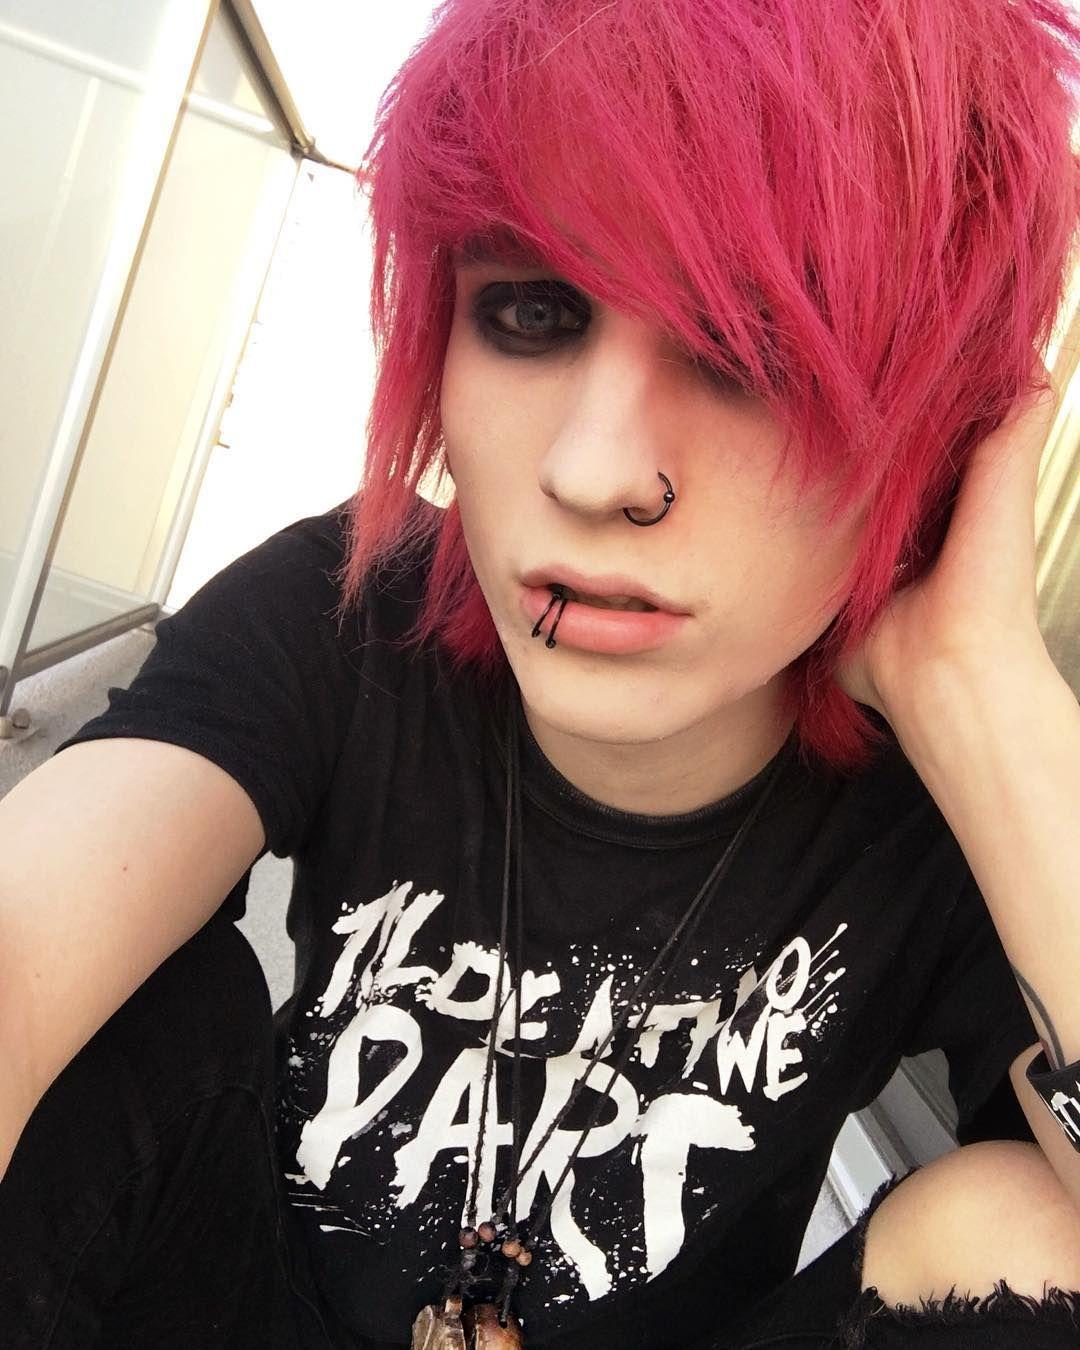 He looks so good with red hair | Cute emo boys, Scene guys, Cute emo